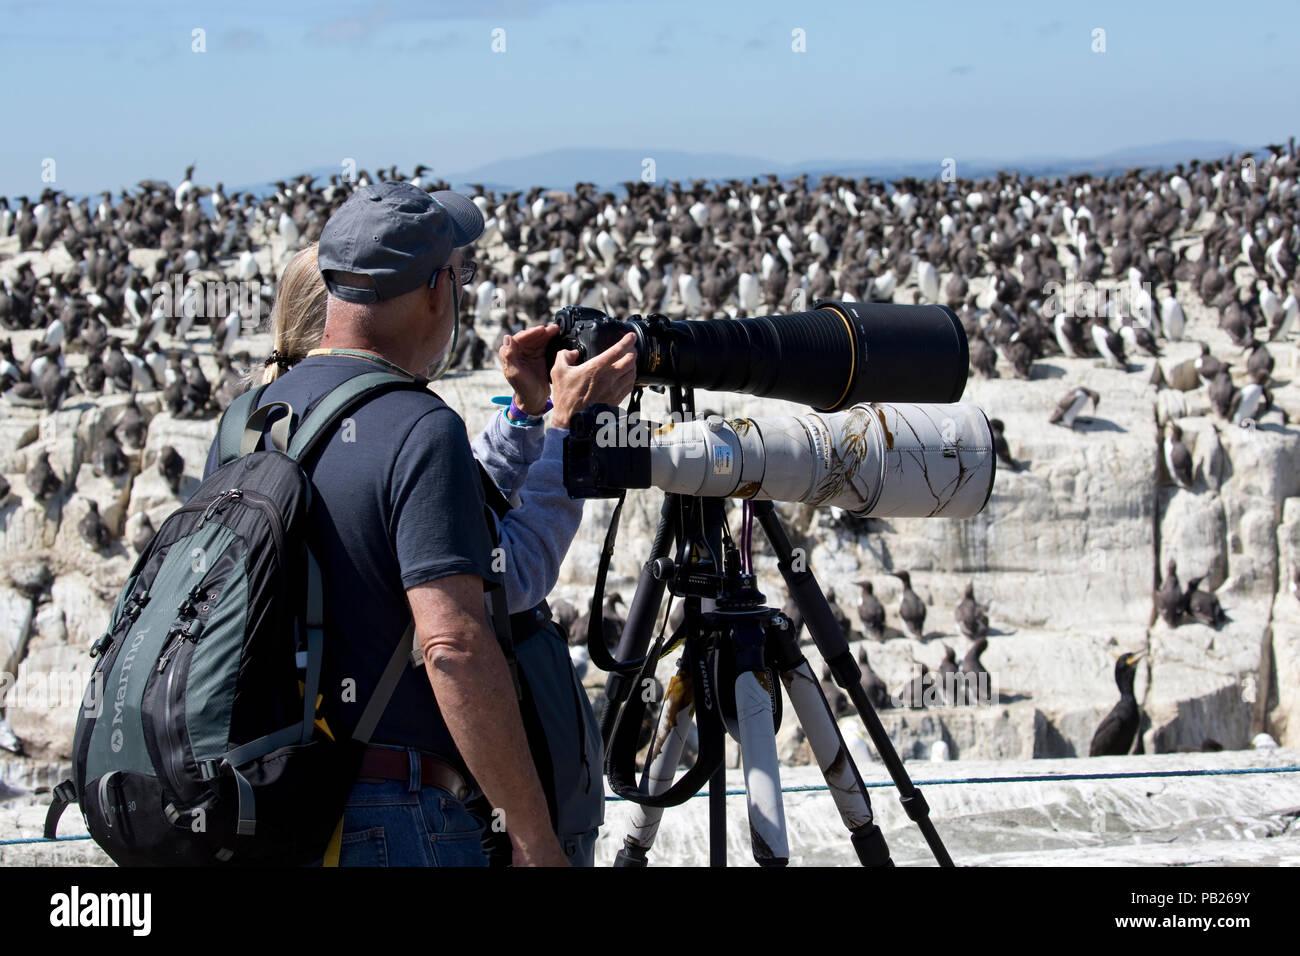 Two people telephoto lenses tripods photographing birds Farne Islands Northumberland UK - Stock Image